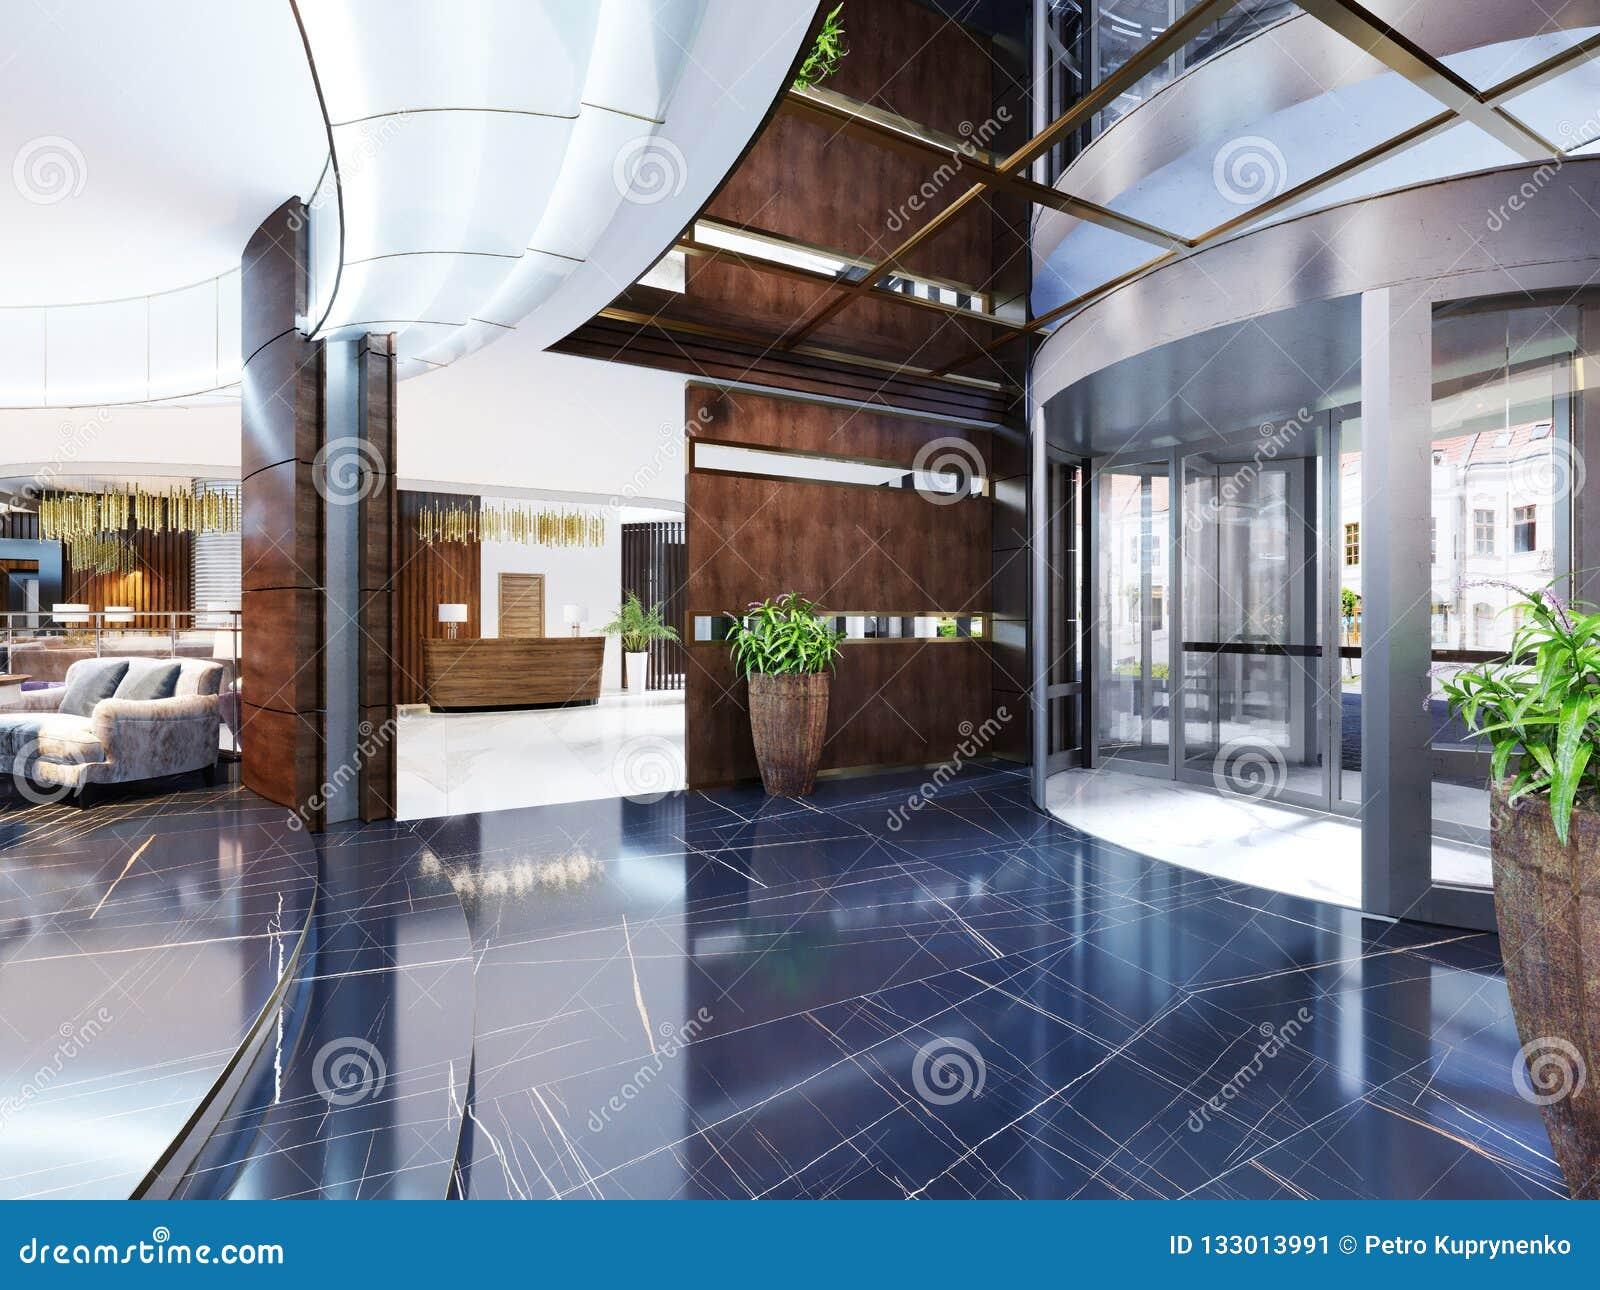 Modern Interior Of Cozy Bar Restaurant Contemporary Design In T Stock Illustration Illustration Of Ceiling Building 133013991